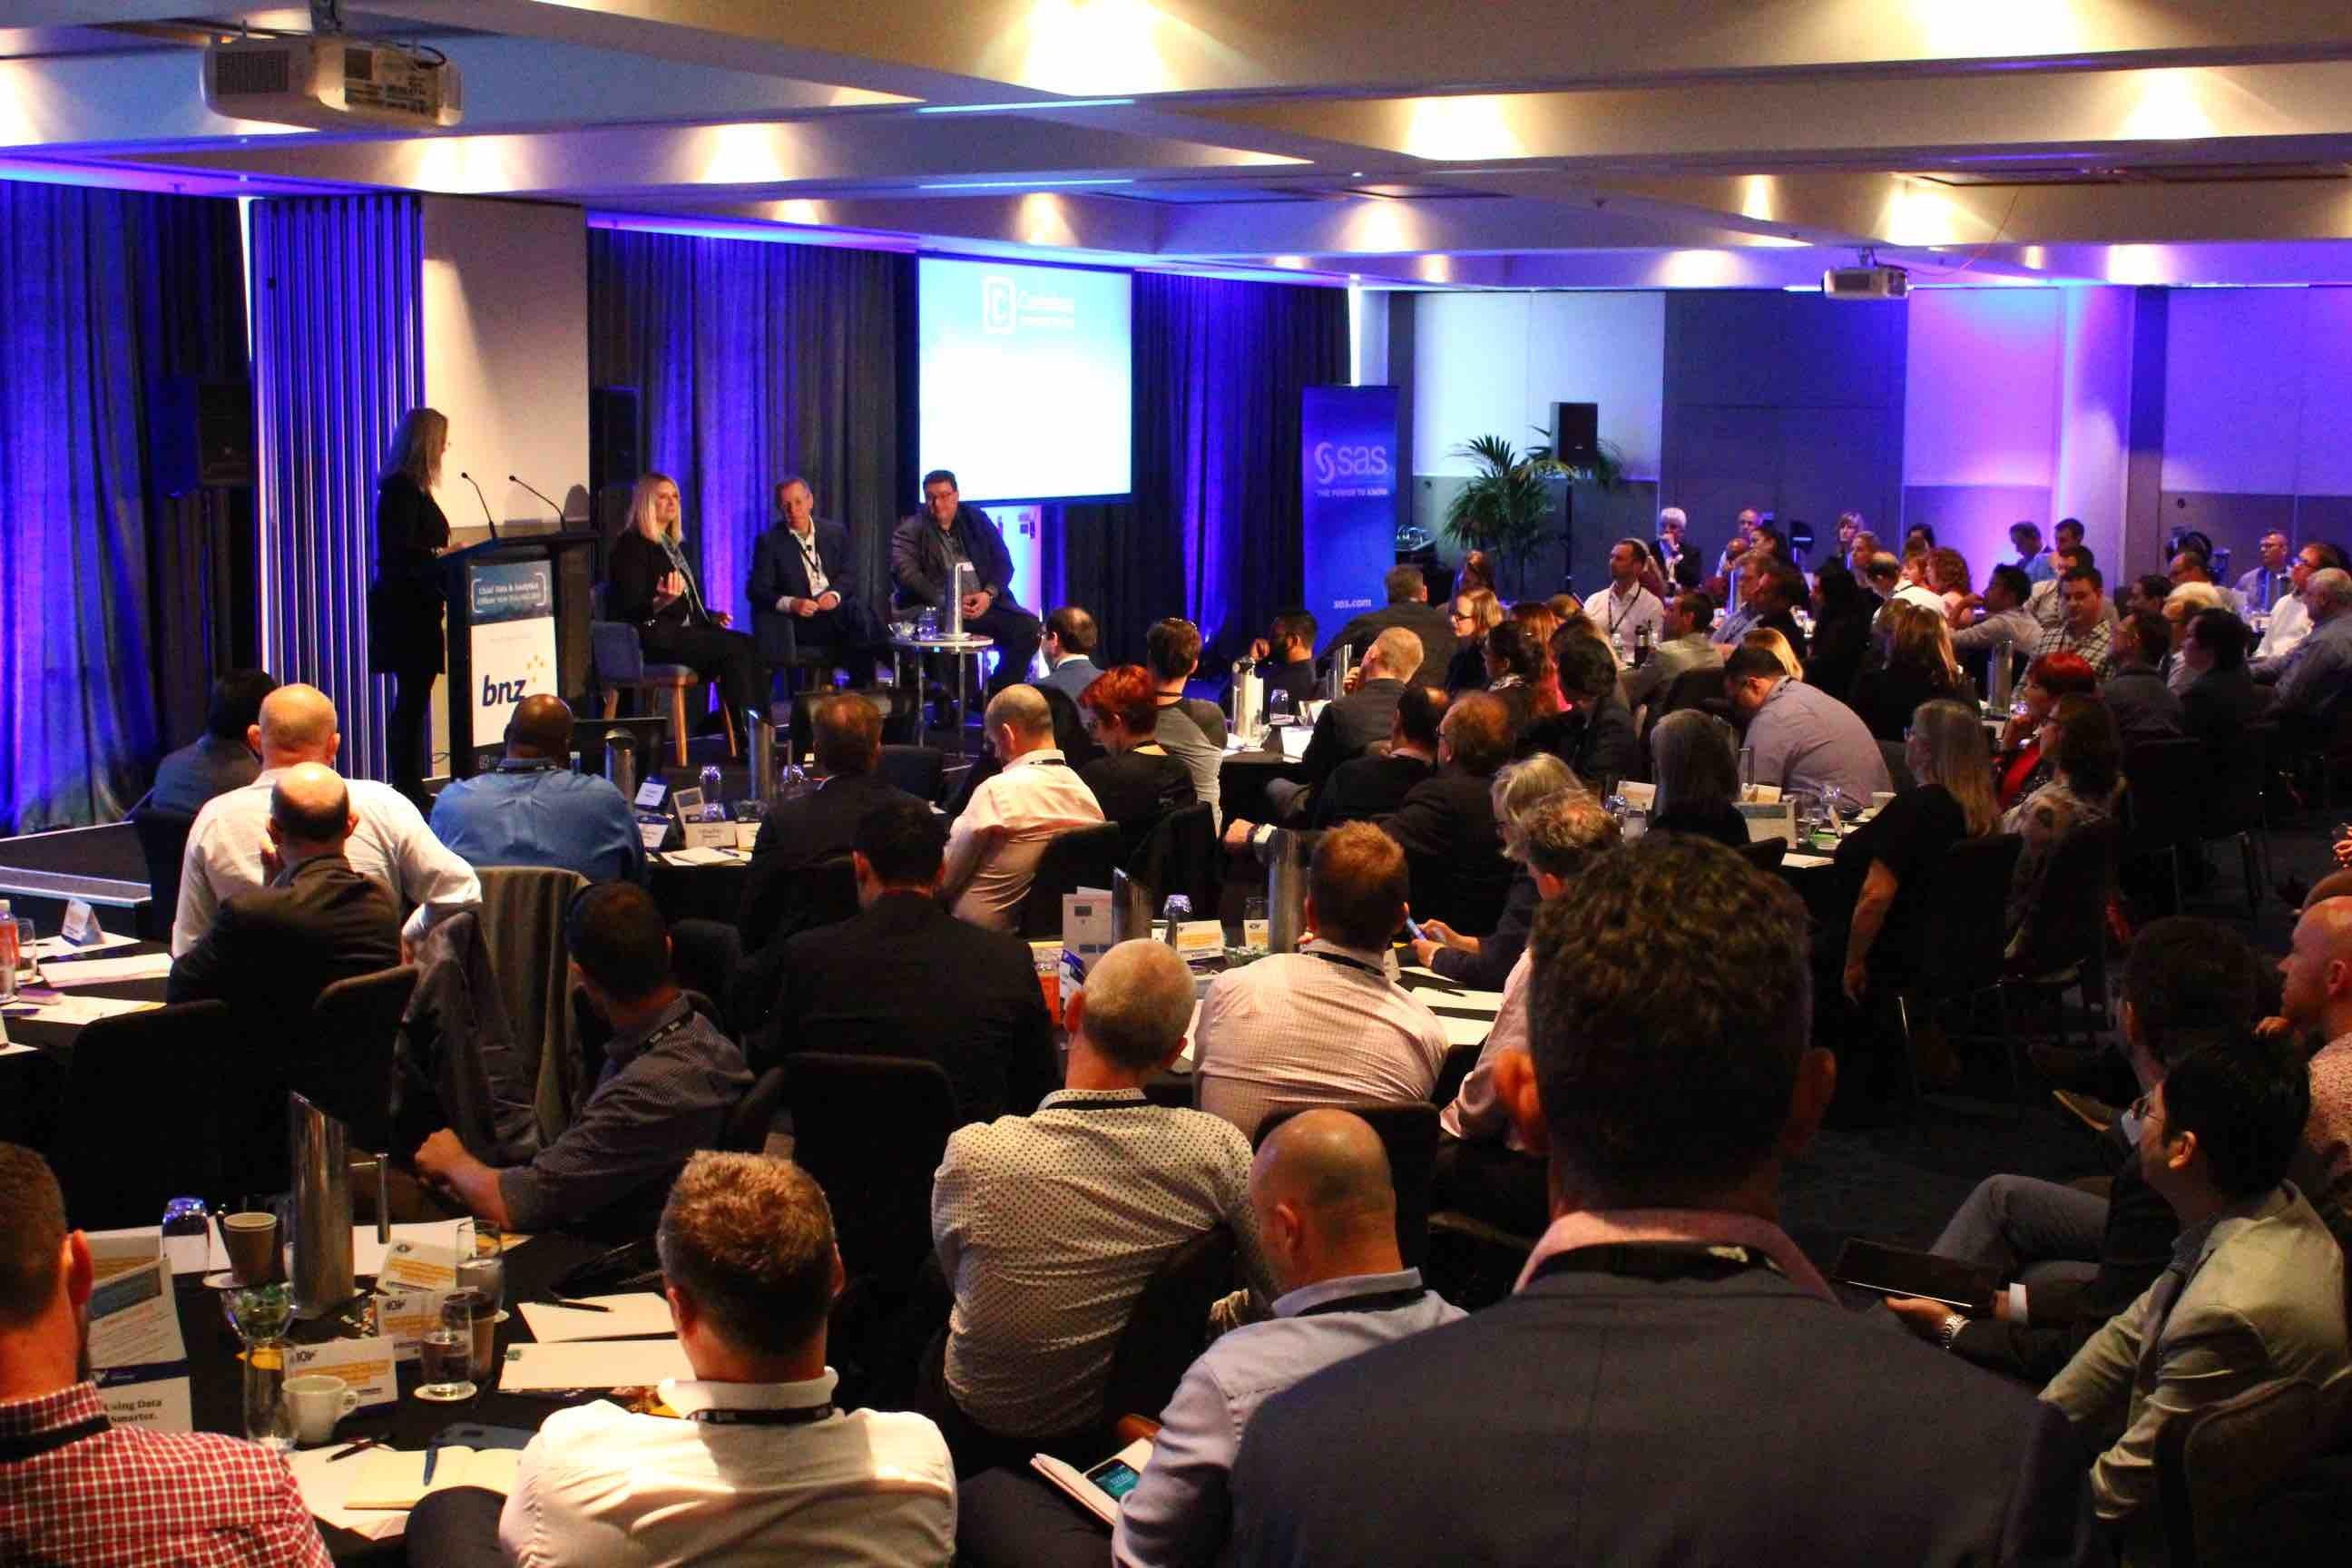 CDAO New Zealand Main Conference Room New Zealand